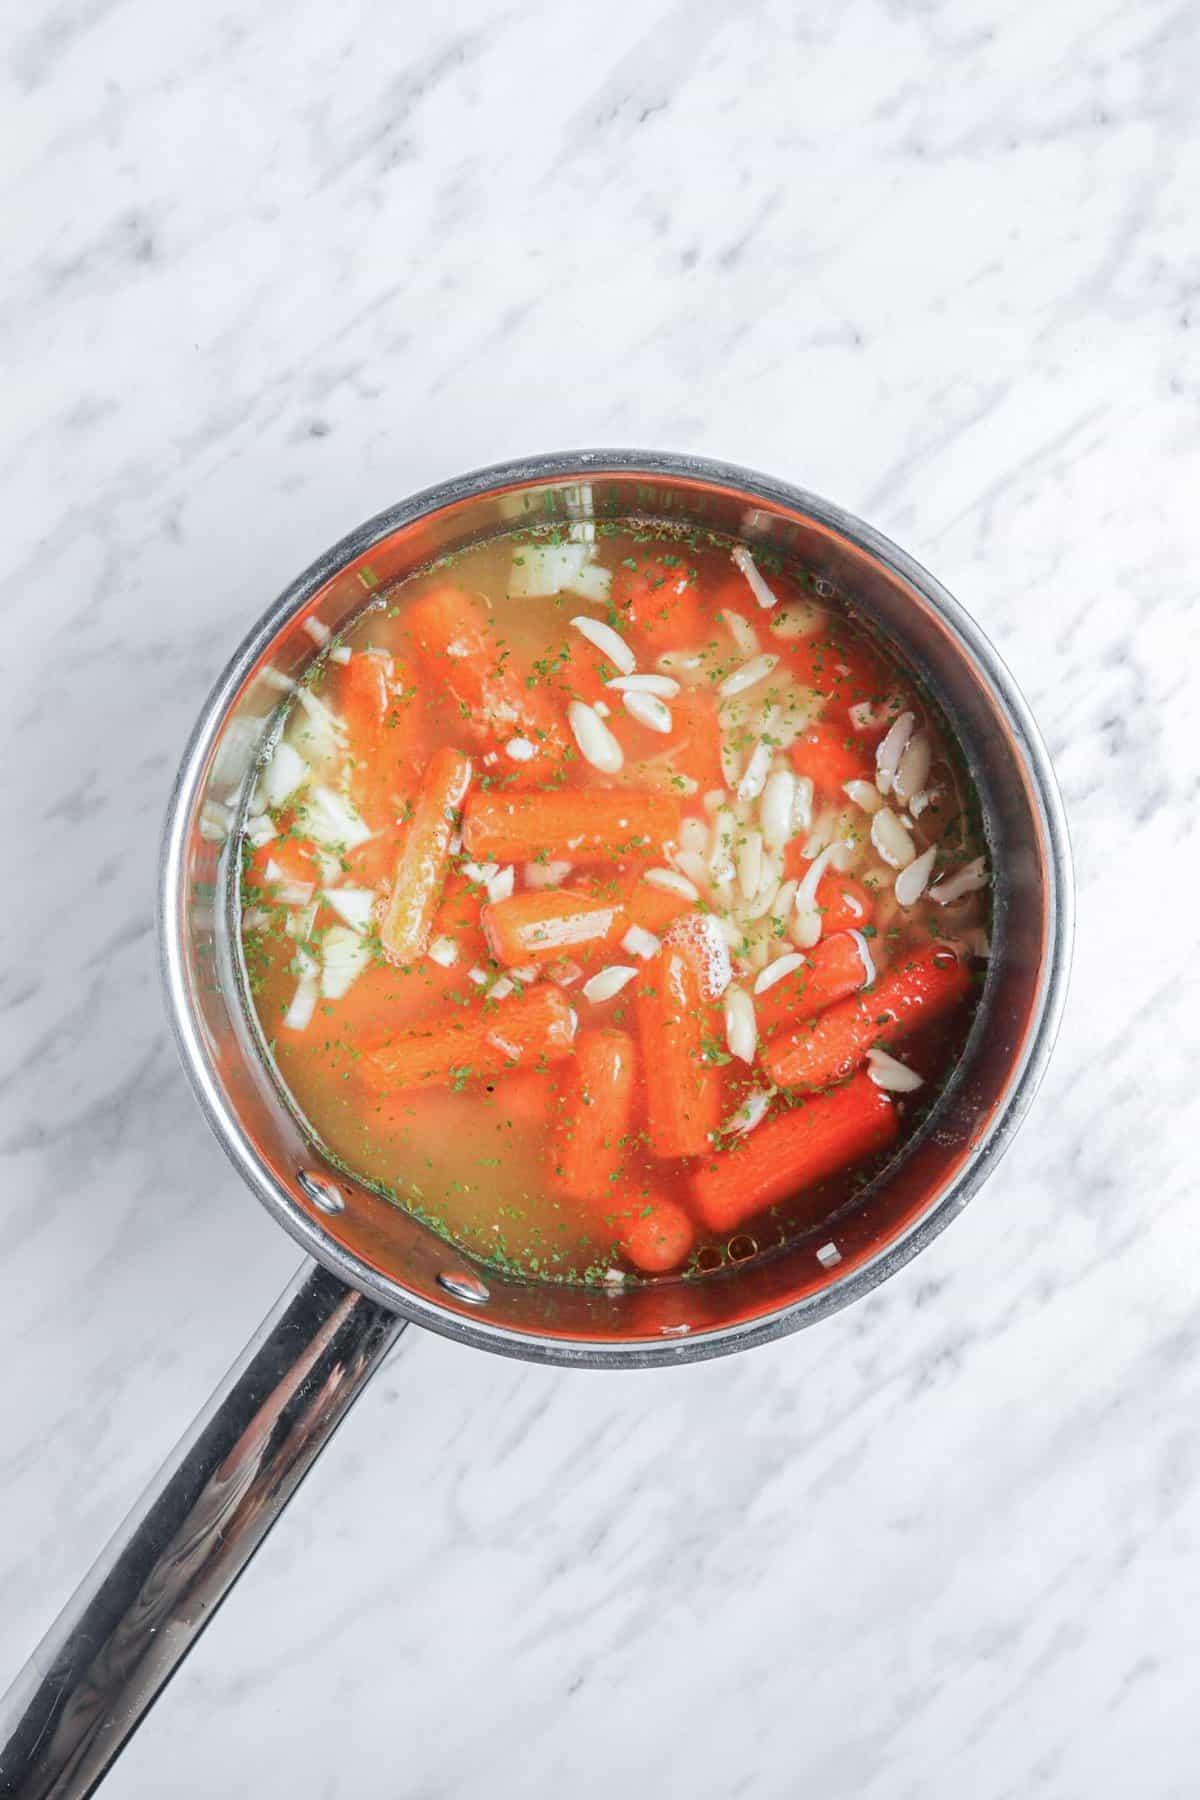 Making Vegan Carrot Ginger Soup